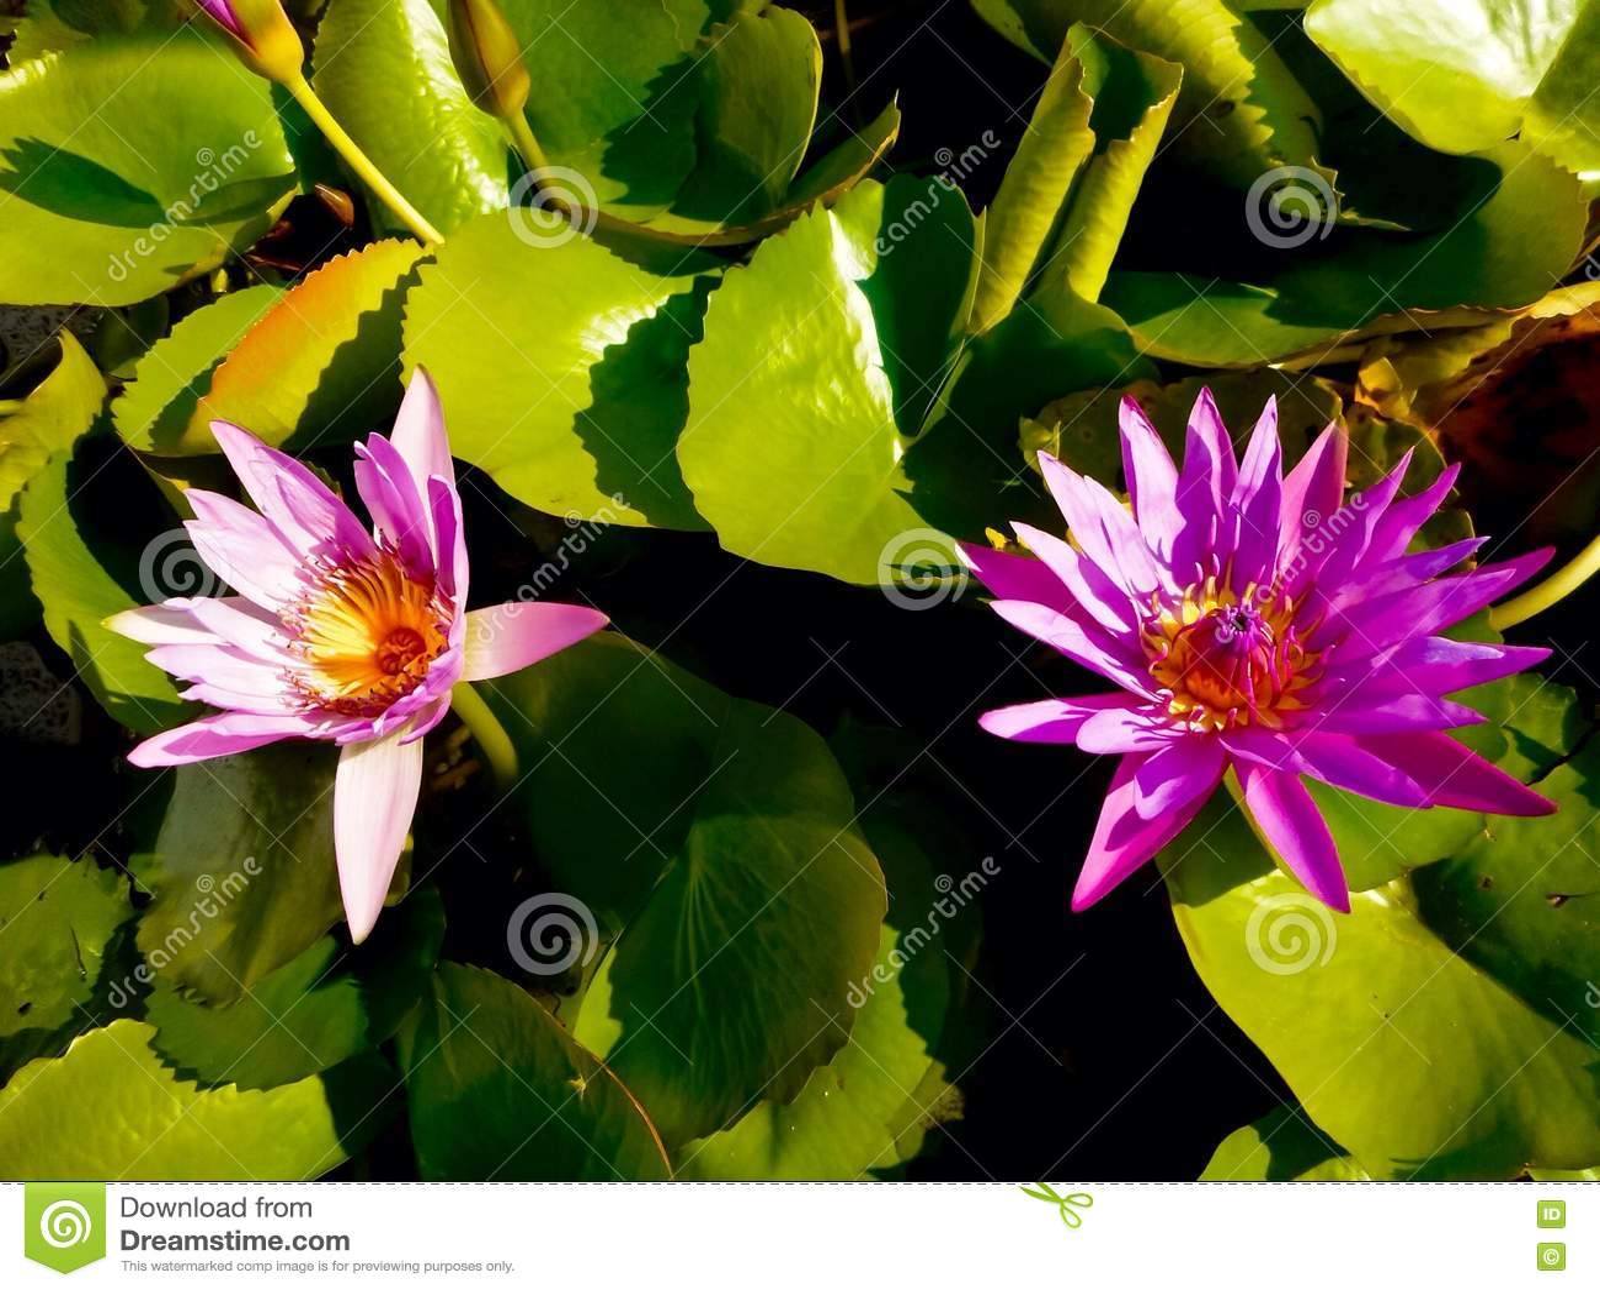 Carta Da Parati Fiori Di Loto : Carta da parati rosa del loto immagine stock immagine di flora